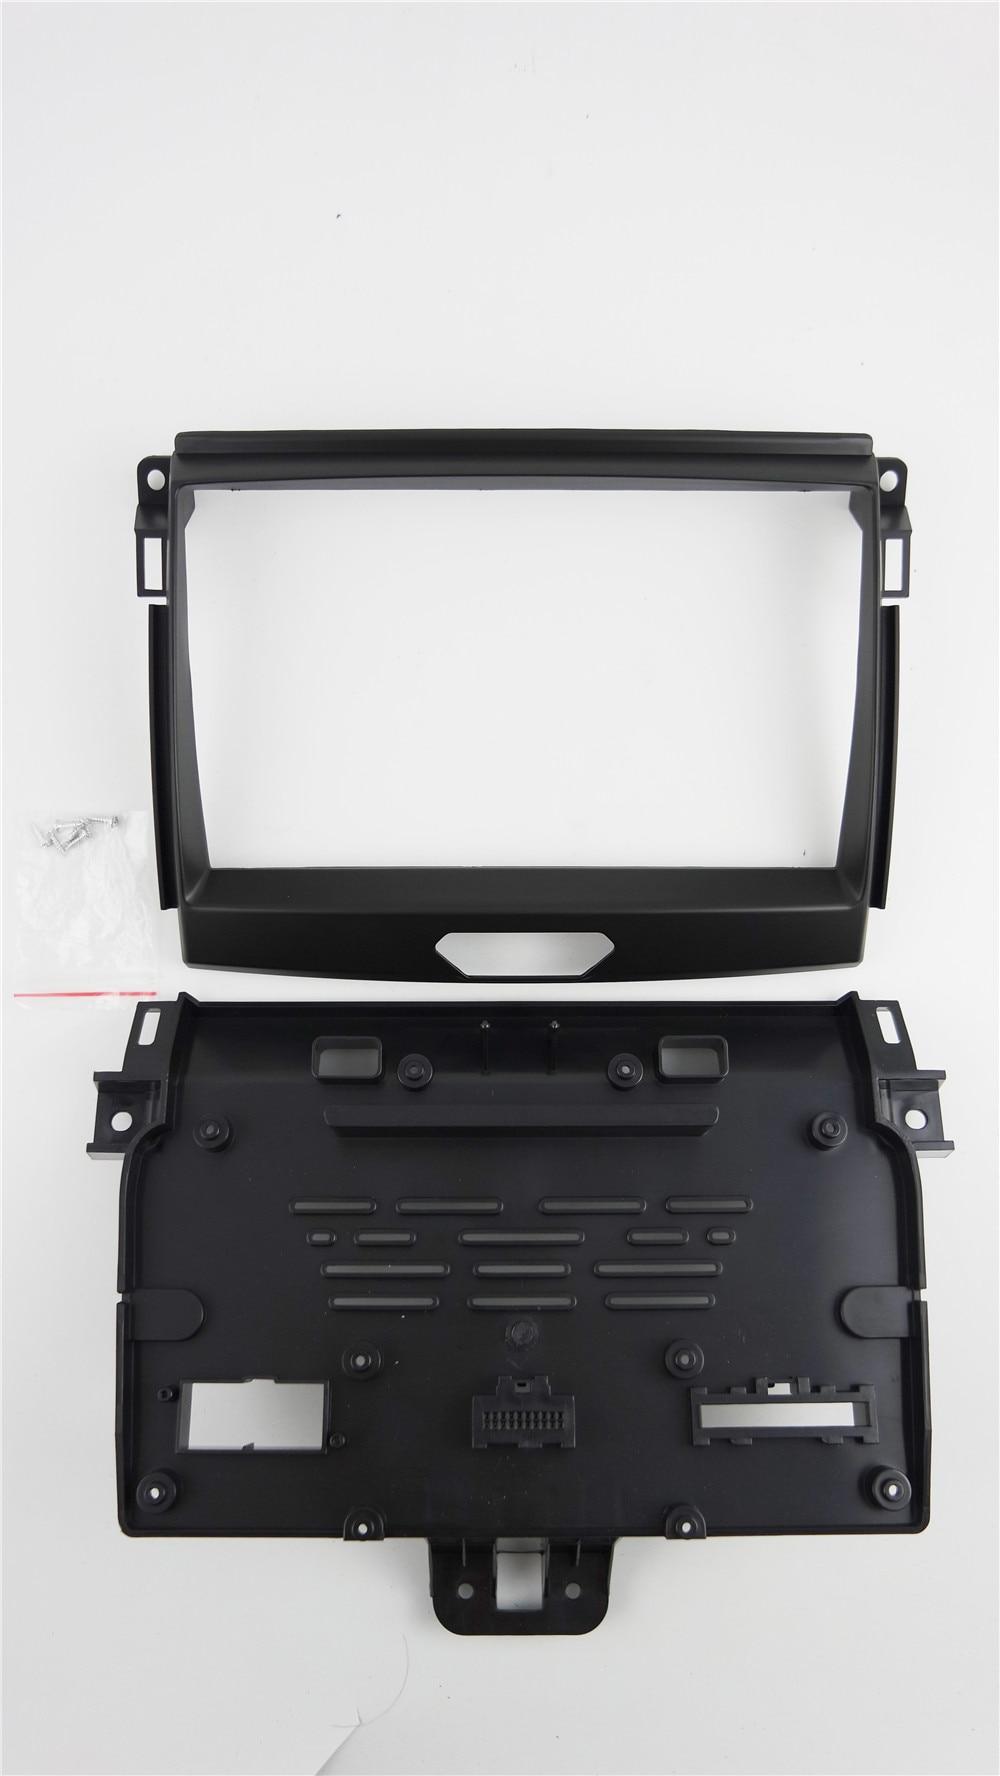 Special 9inch Car Radio Fascia Dash Trim Kit for Ford Everest for Ford Ranger 2015+ Stereo DVD Player Refitting Frame